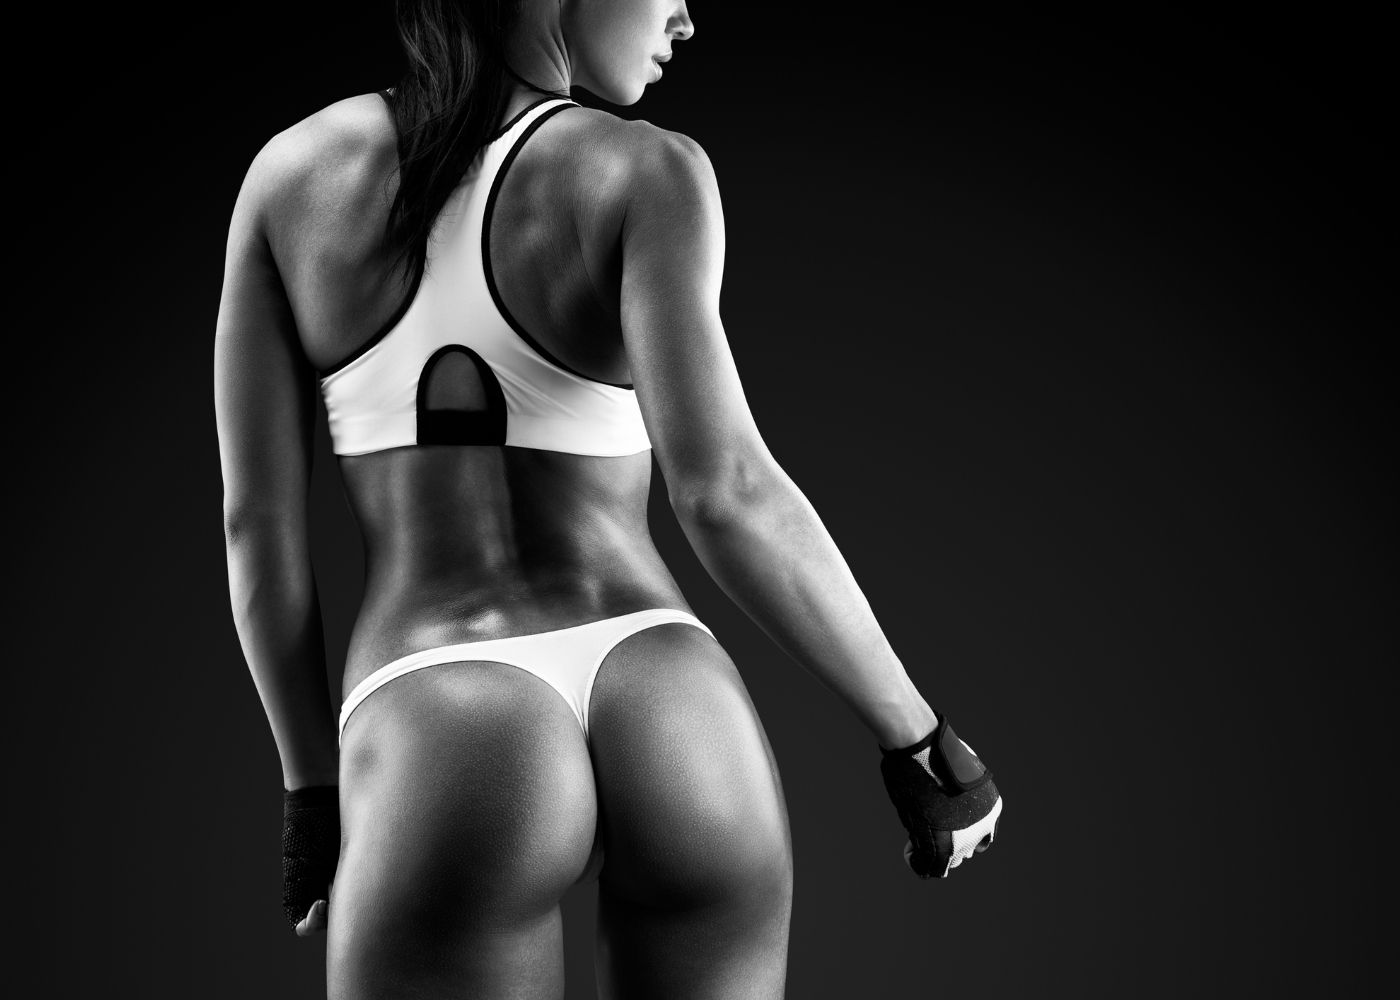 sexo depois do treino mulher sexy ginasio